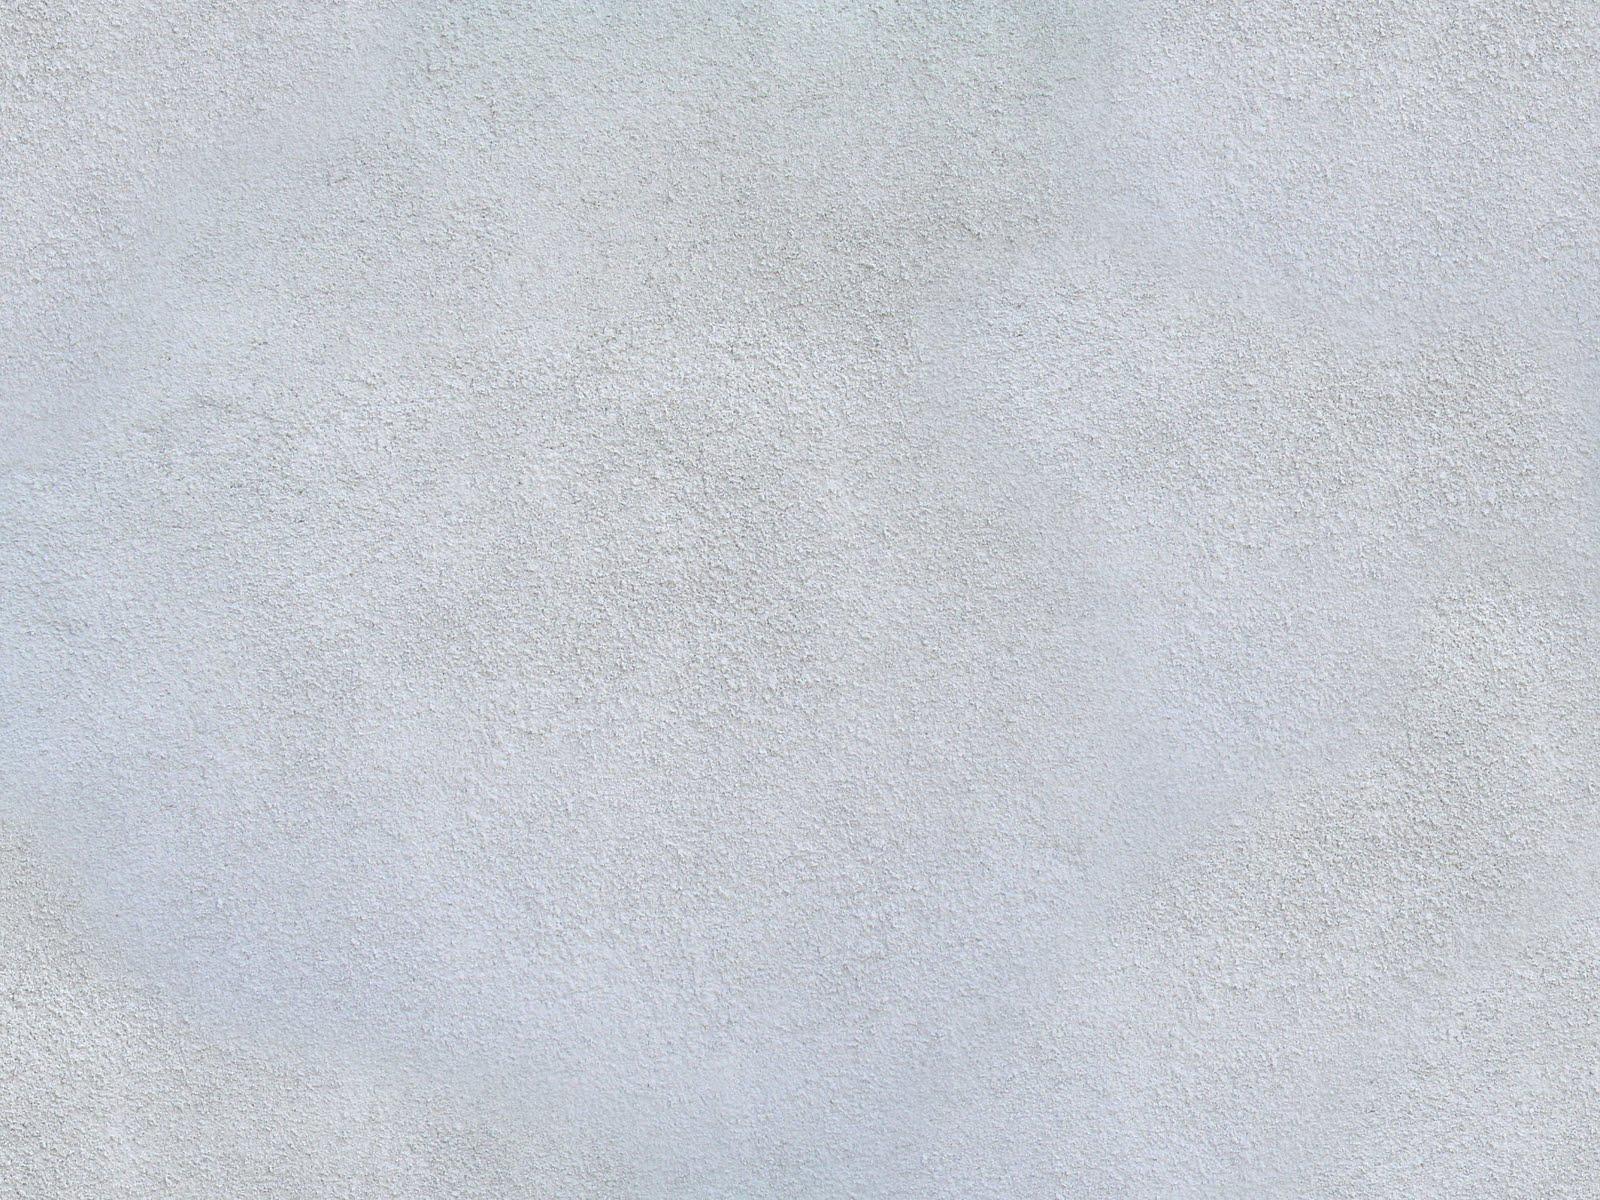 Modren Concrete Flooring Texture Stock Images Royaltyfree On Decorating Ideas